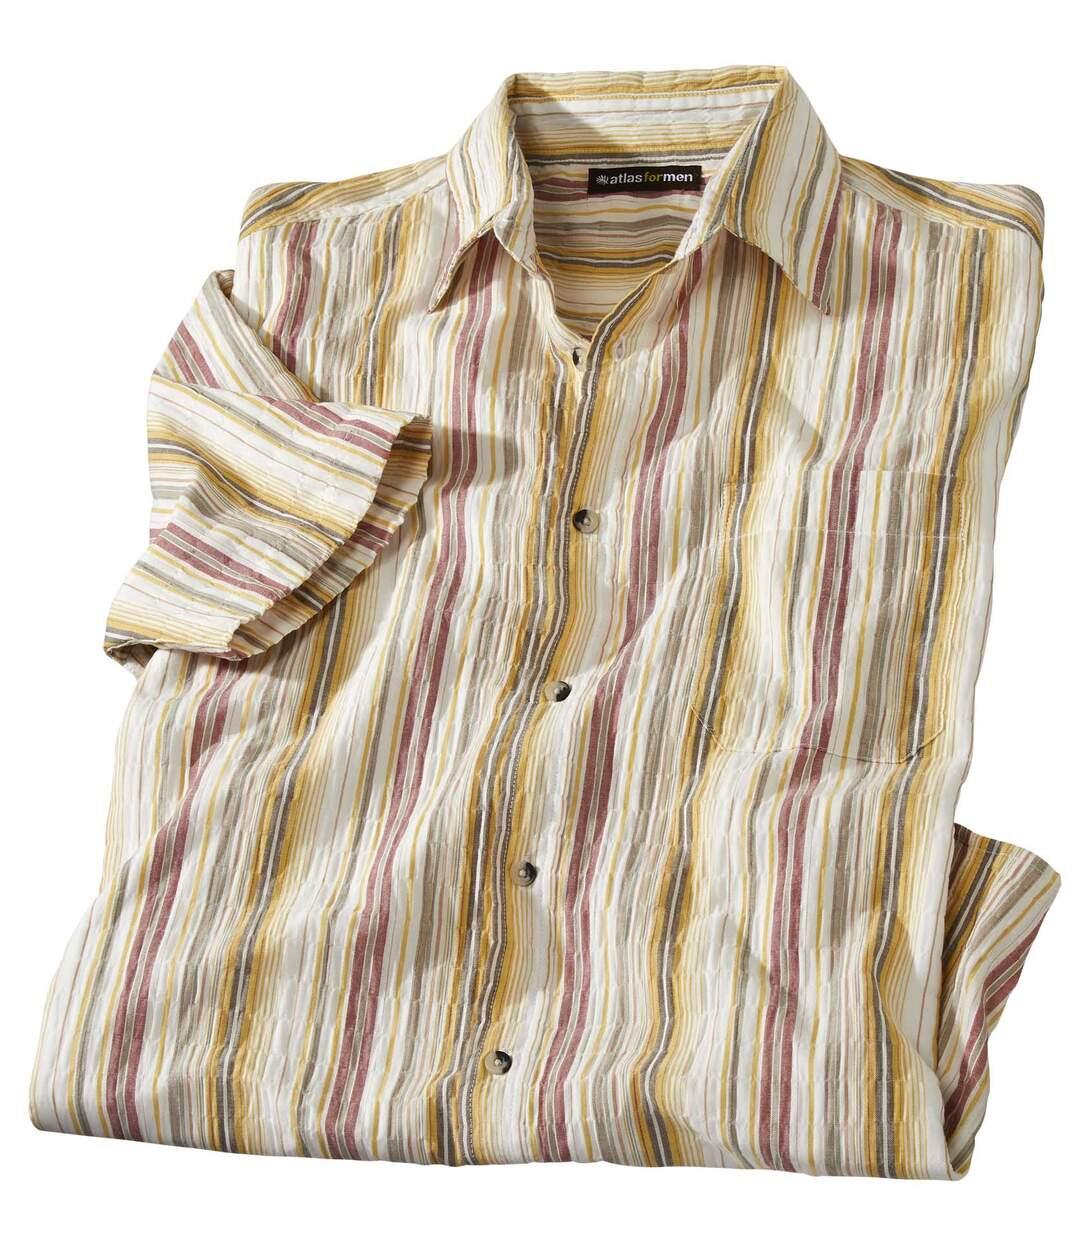 Koszula  z kreponu w paski Alizée Atlas For Men